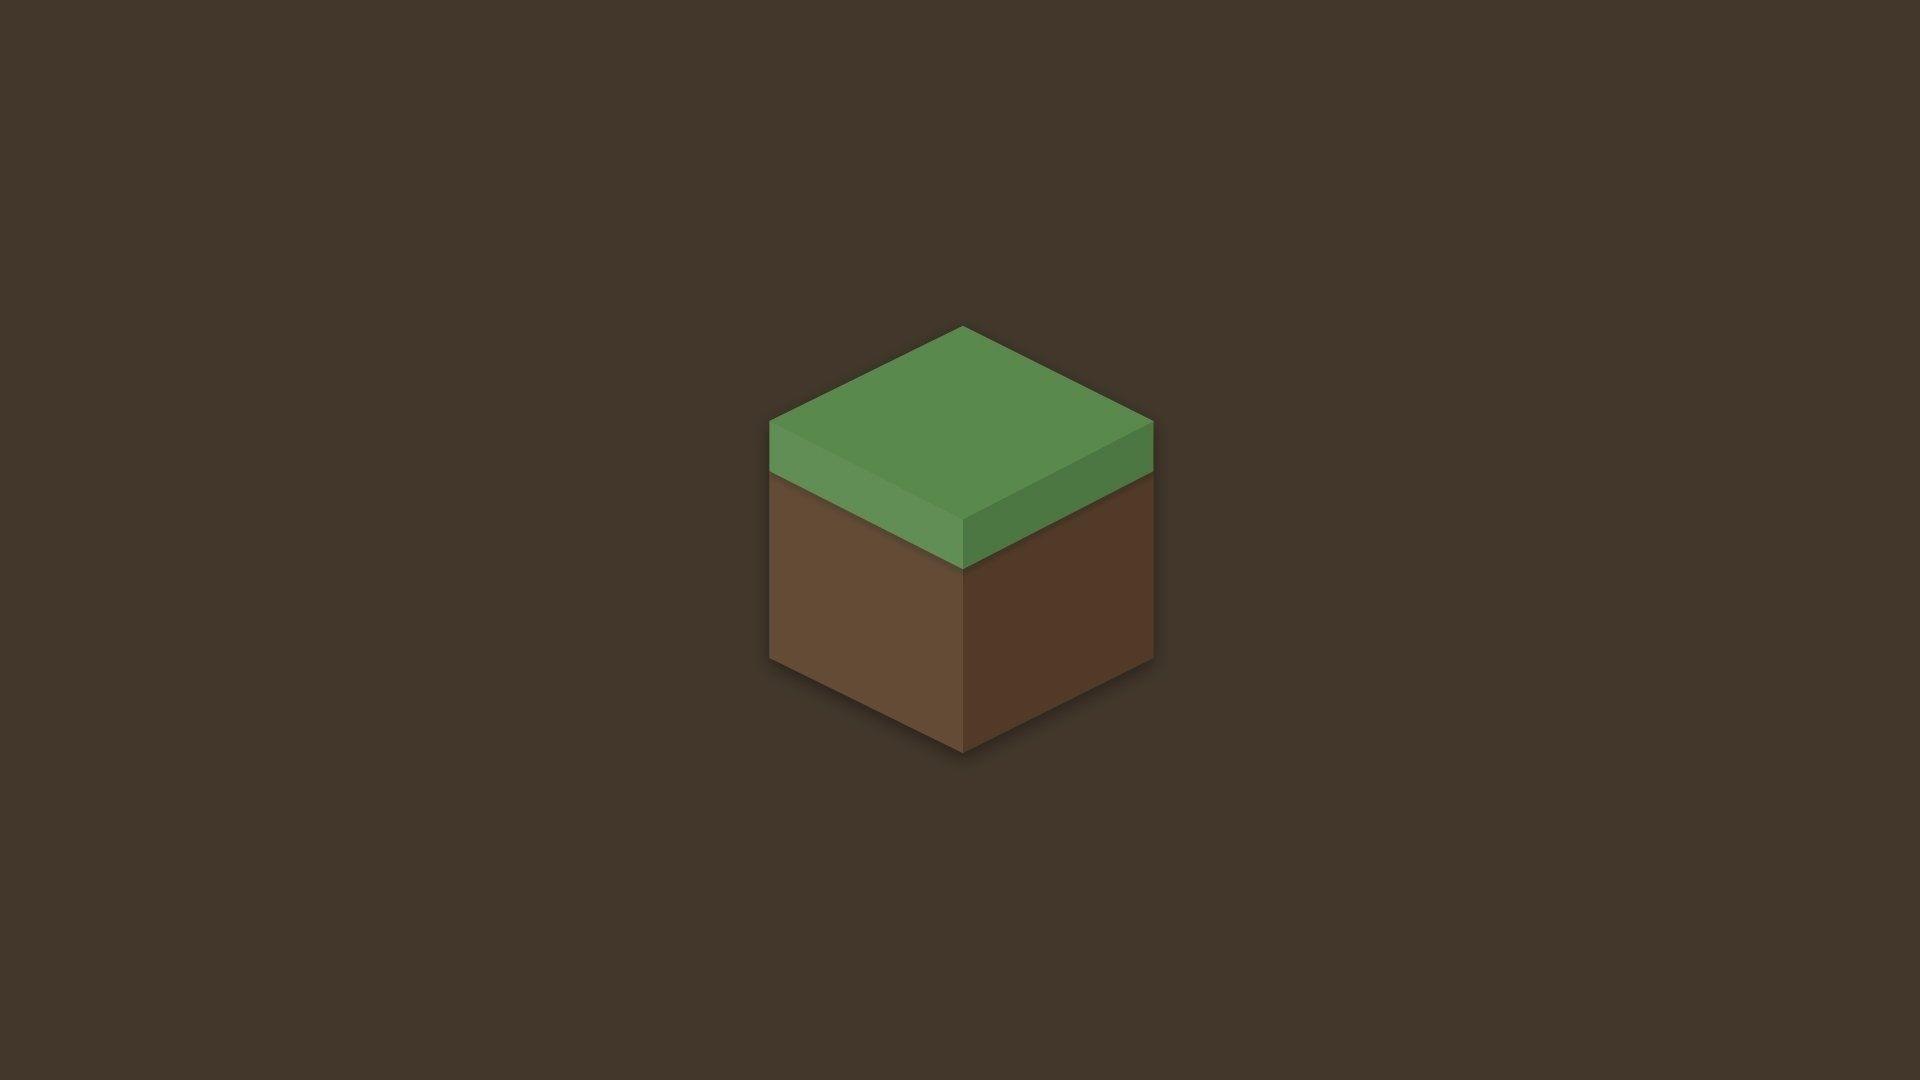 Minecraft free picture